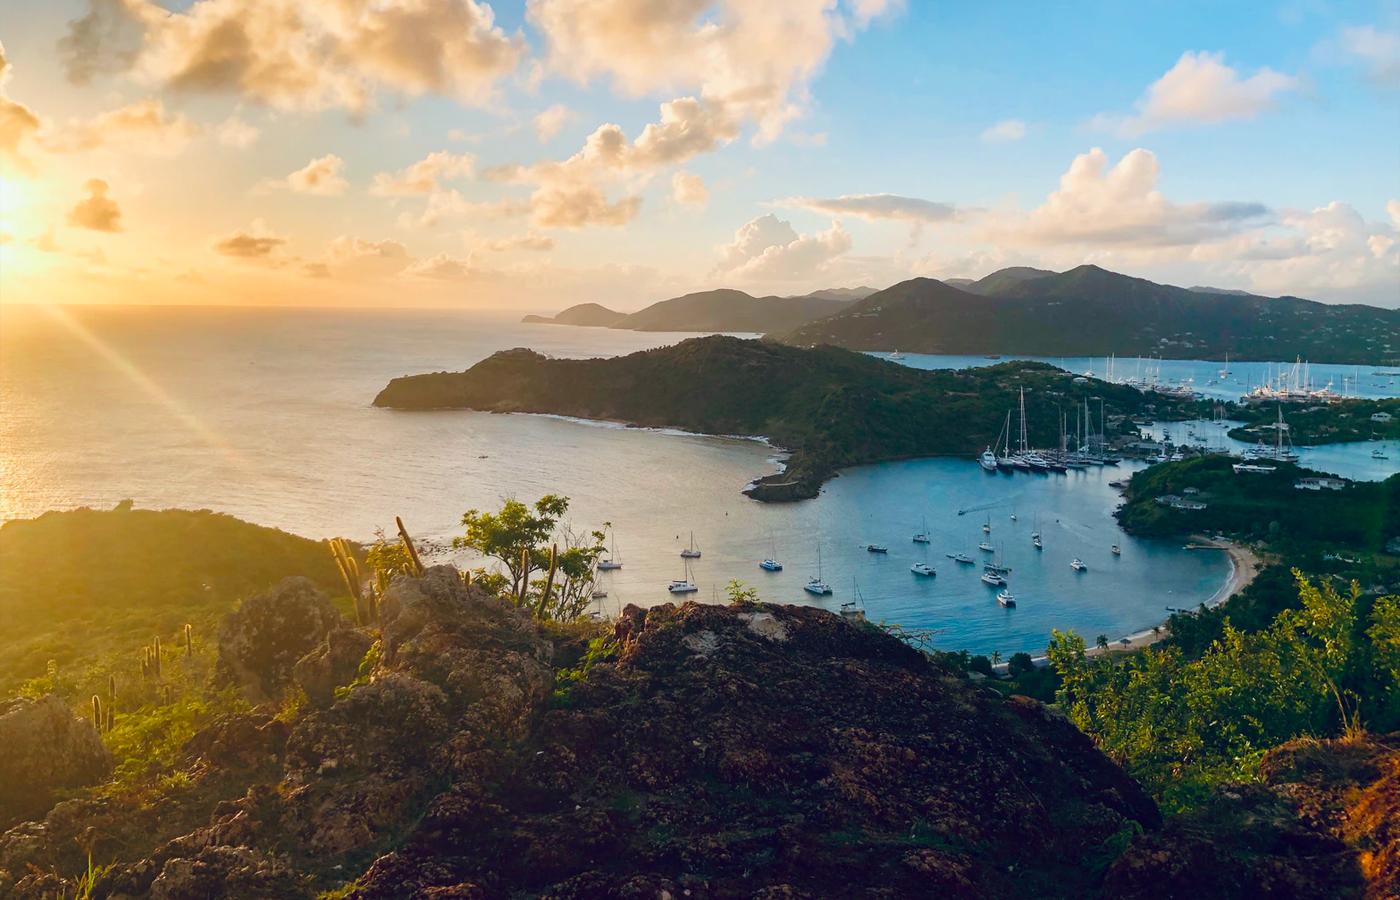 Yacht Charter Vacation: Leeward Islands [Travel Itinerary]